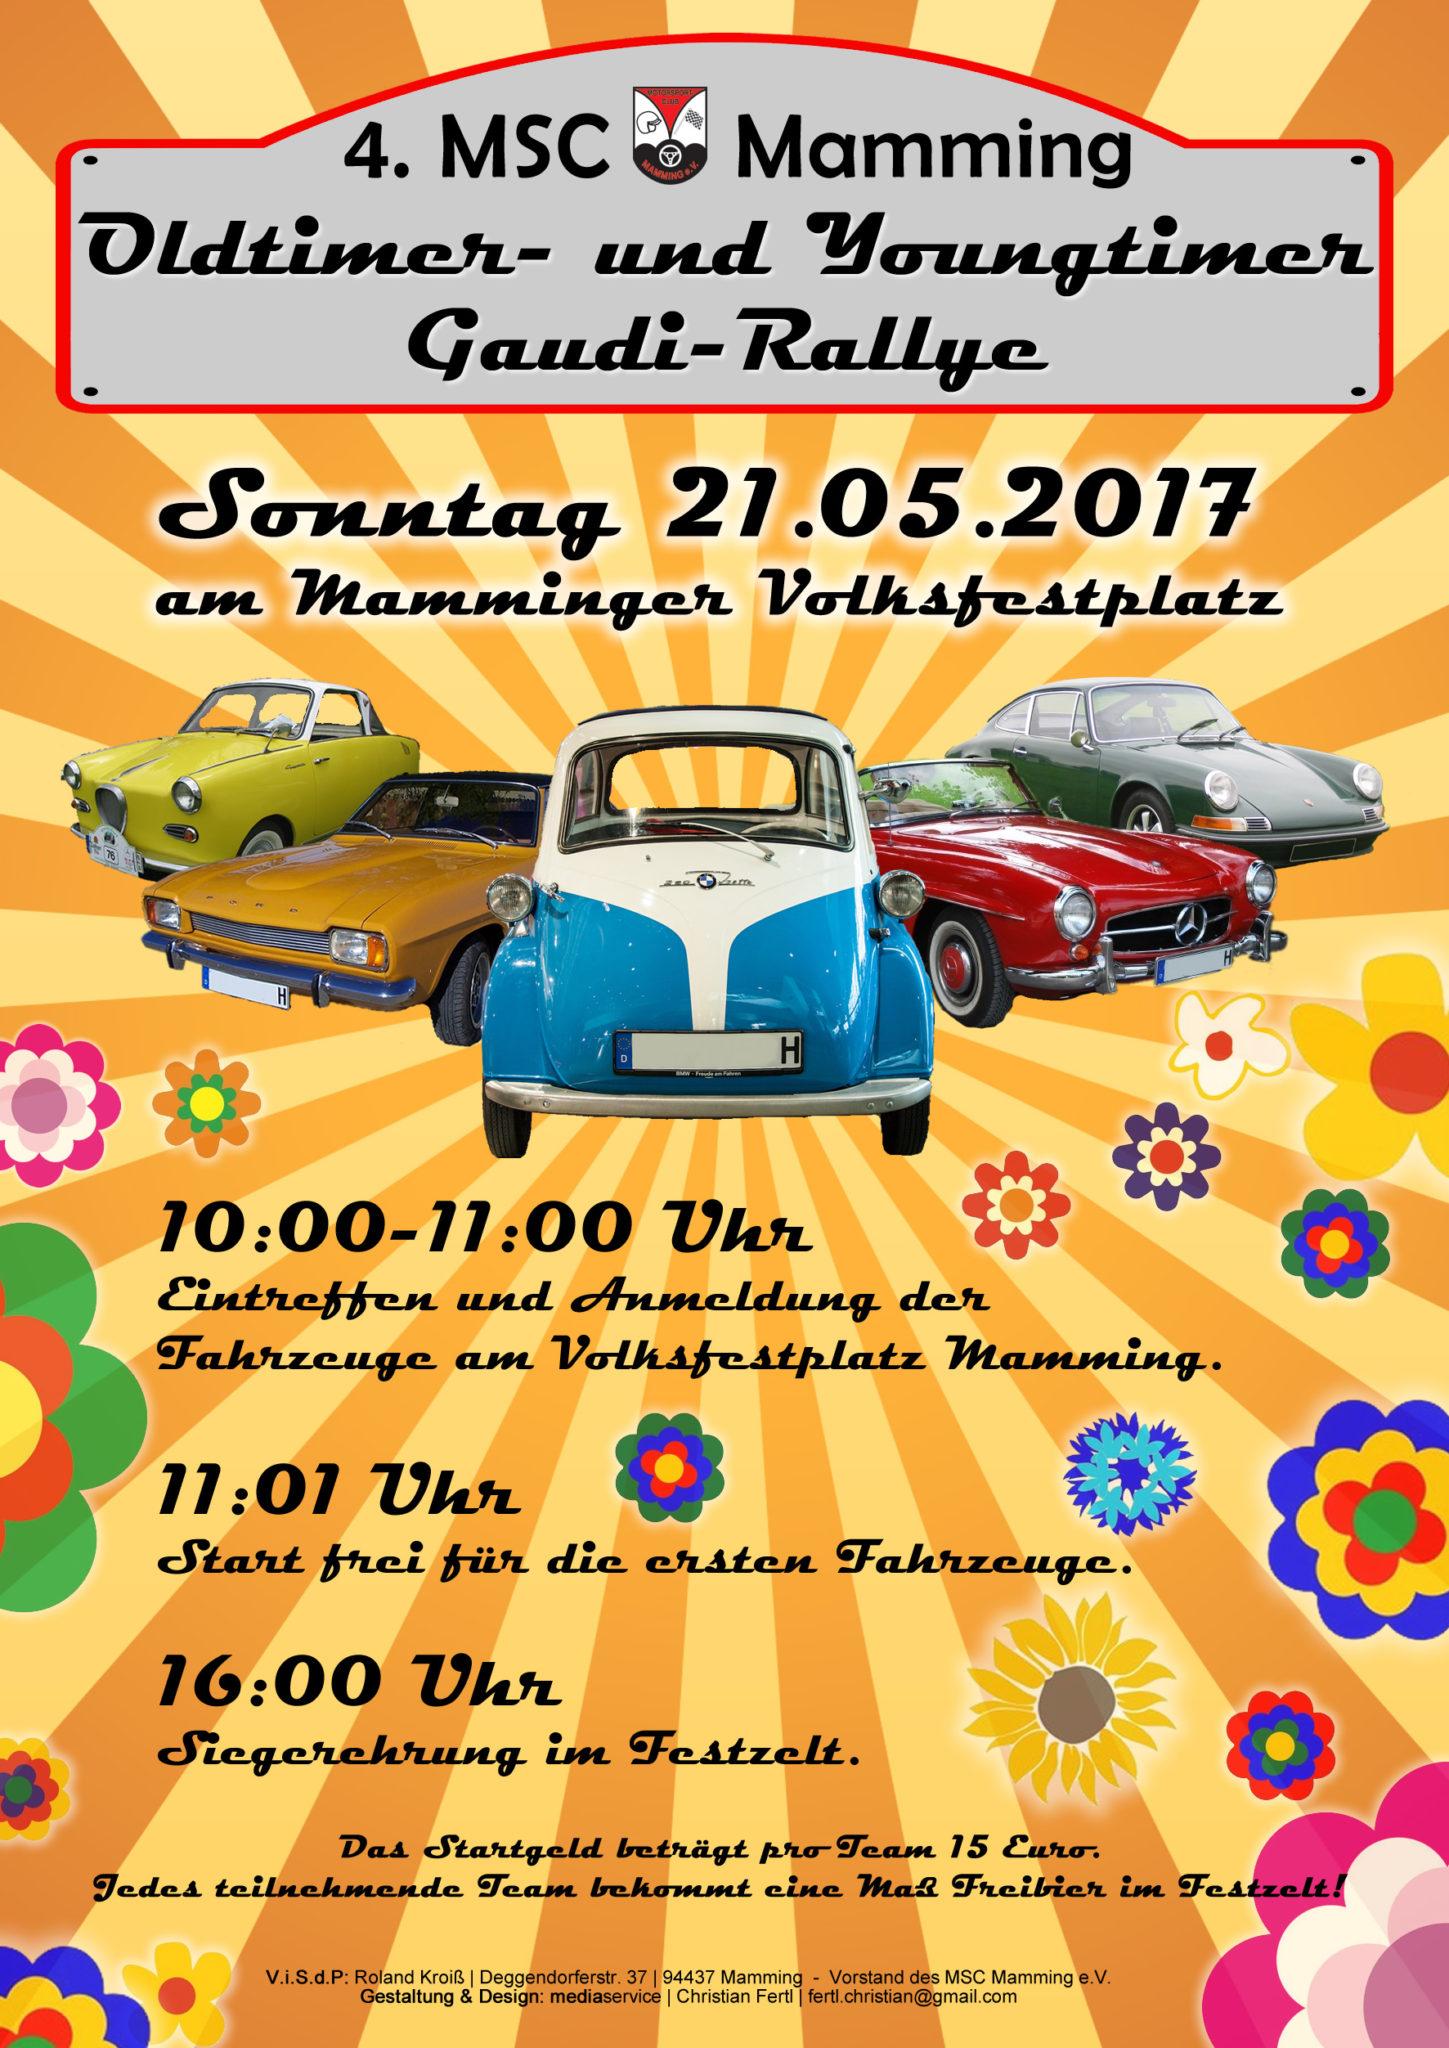 Old- und Youngtimer Gaudi-Rallye